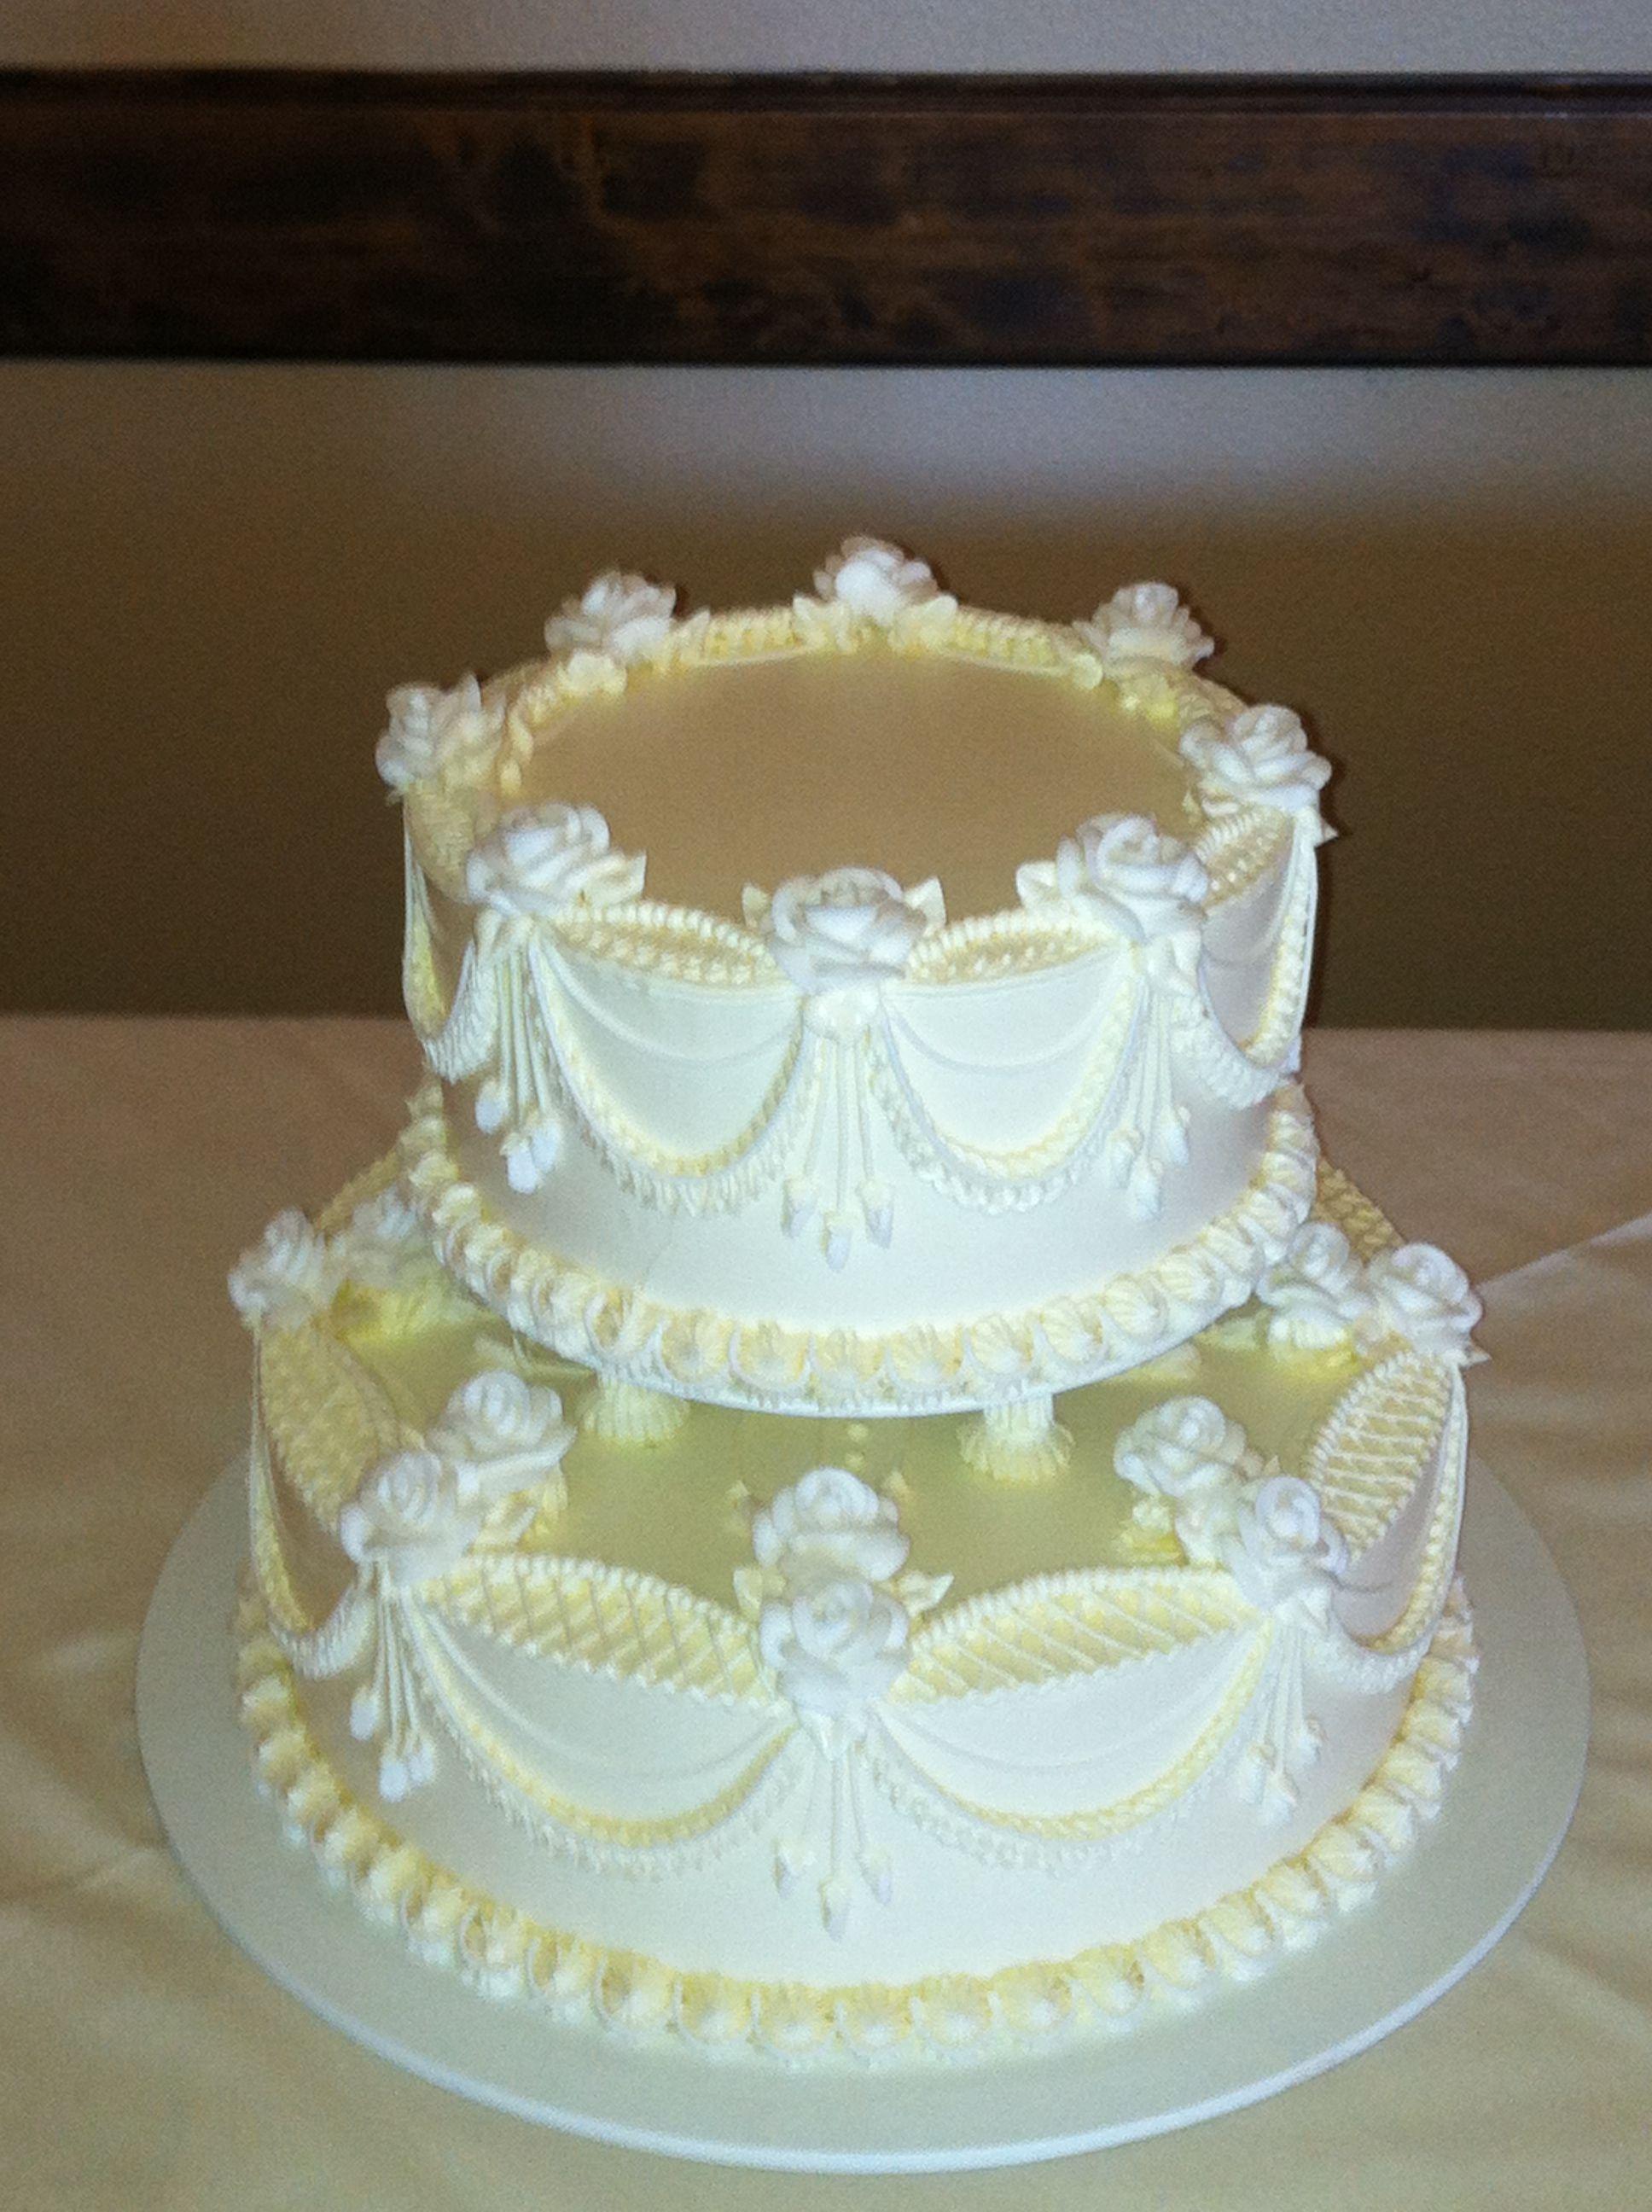 Beaverton Wedding Cakes